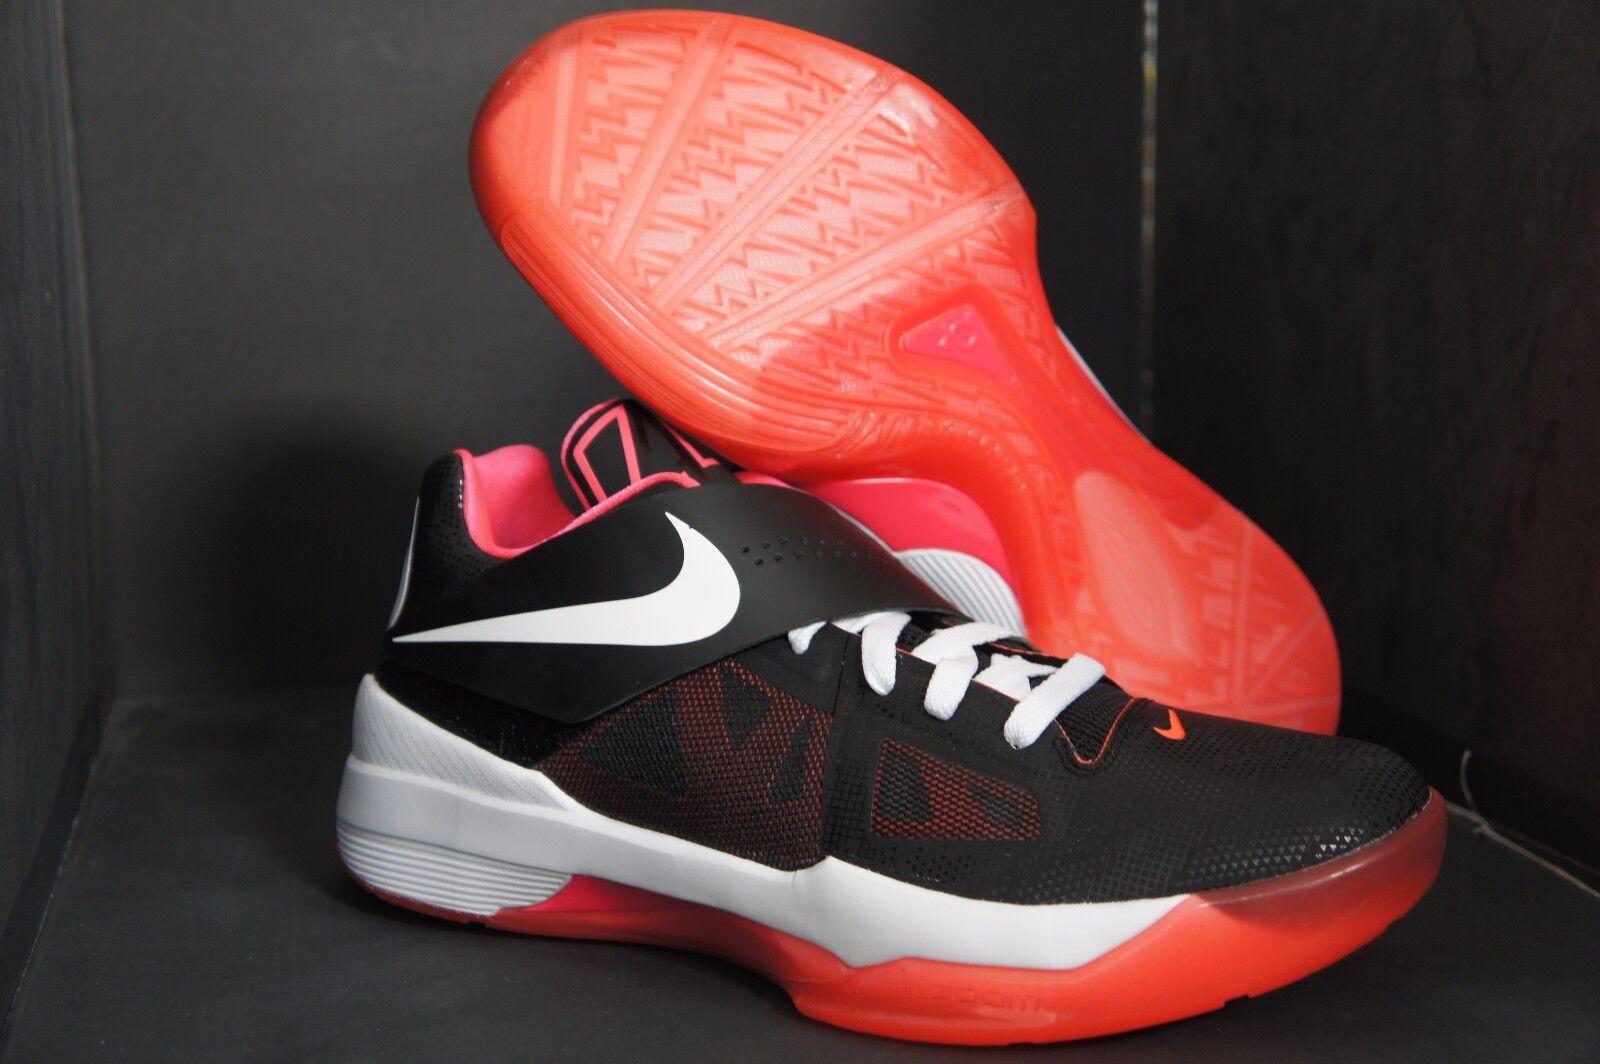 Nike KD 4 Kay Yow Rosa el Galaxy que el Rosa Big Bang Negro N7 id comodo especial de tiempo limitado a5d7d5